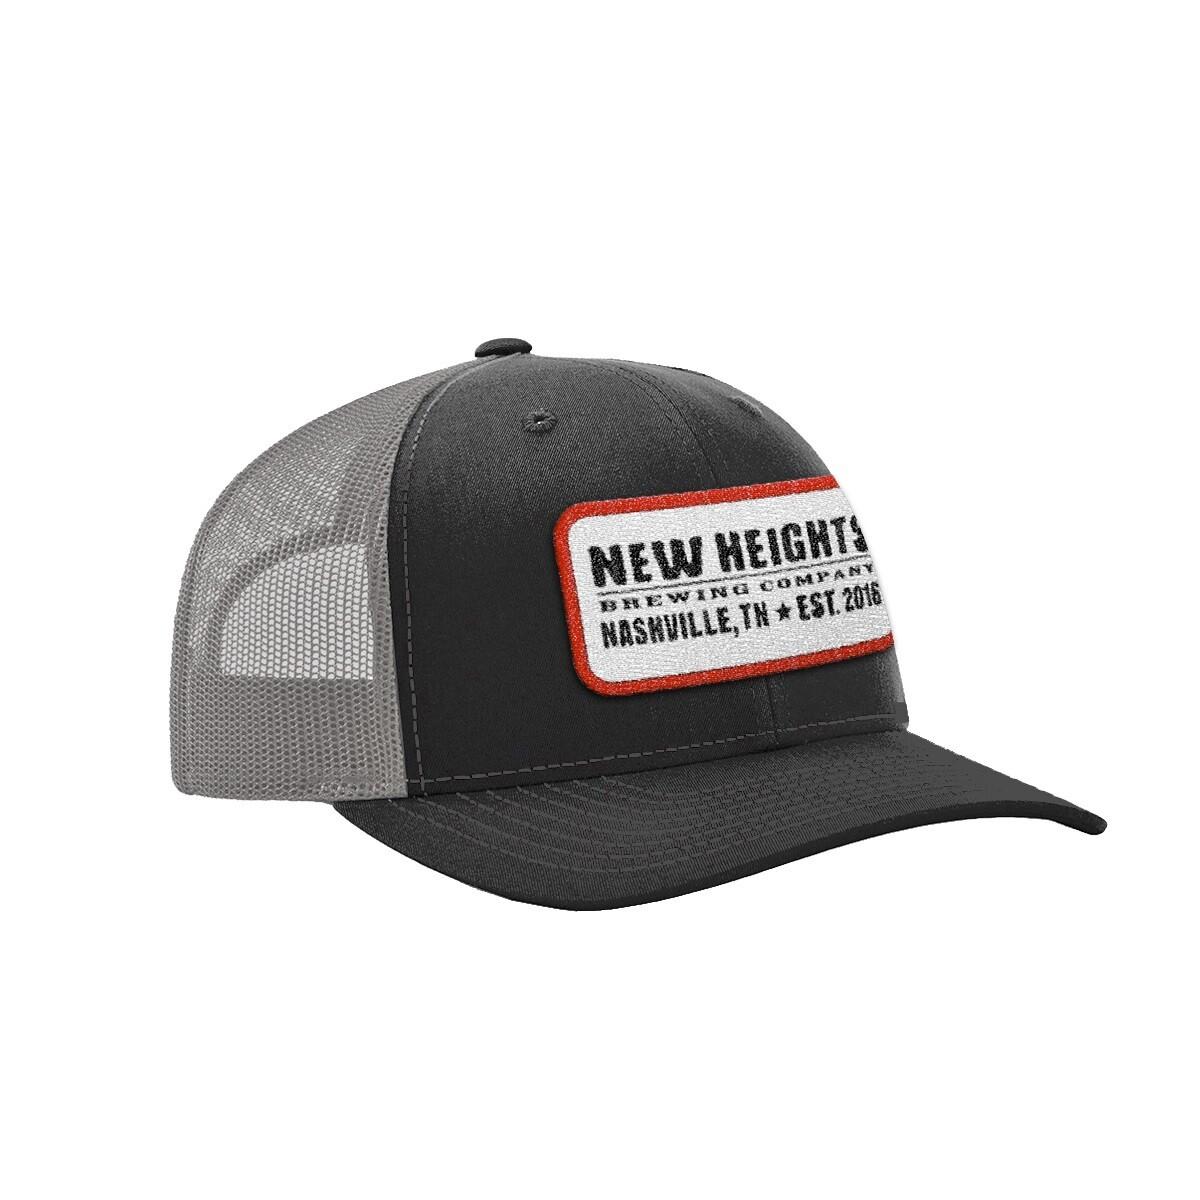 Black Trucker Cap w/Grey Mesh Back/Red Merrow Edge